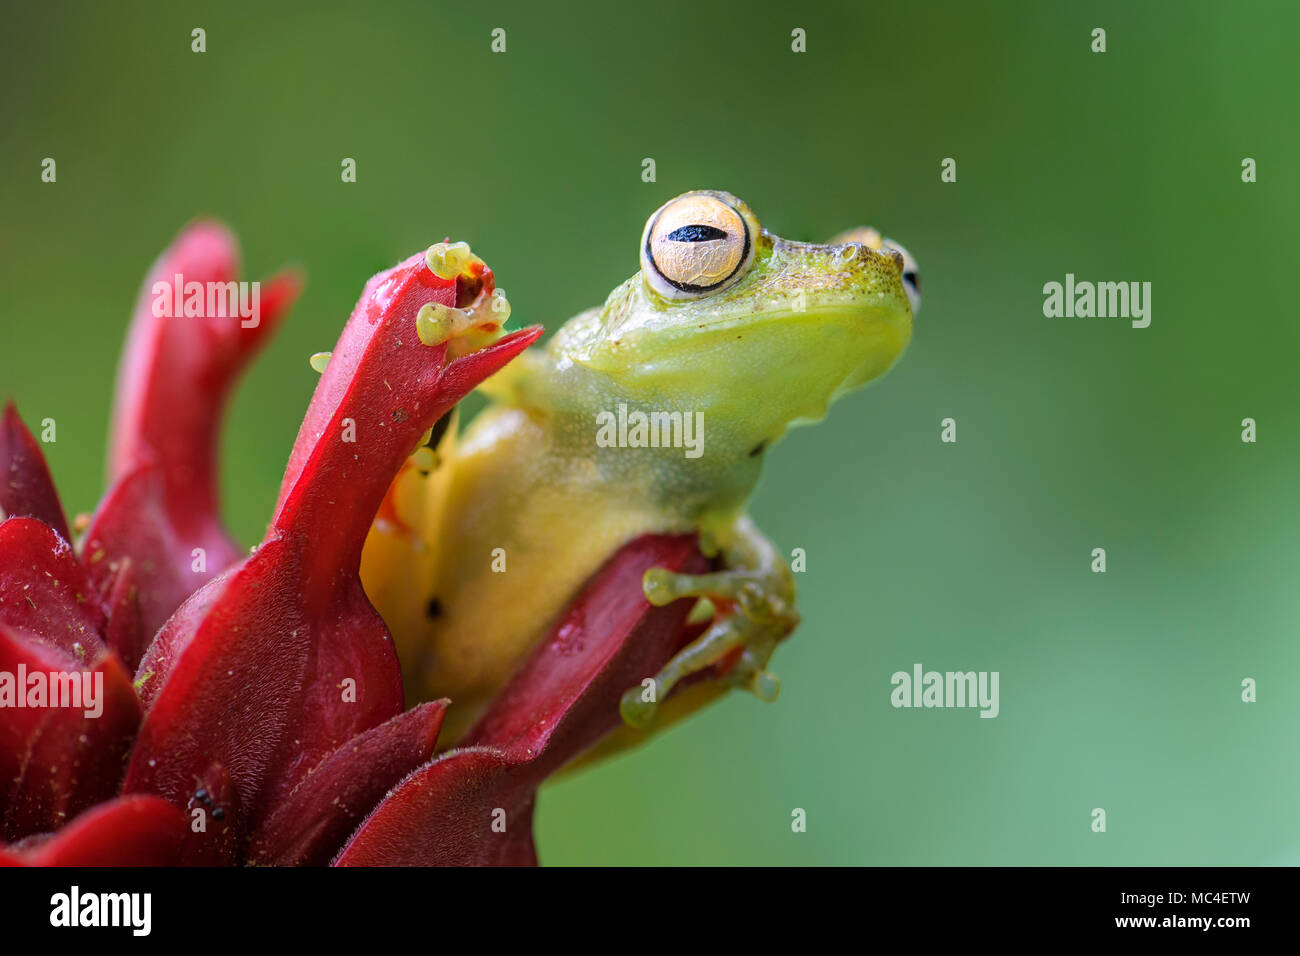 Rot-webbed Laubfrosch - Hypsiboas rufitelus, schönen grünen Frosch aus Mittelamerika, Wälder, Costa Rica. Stockbild